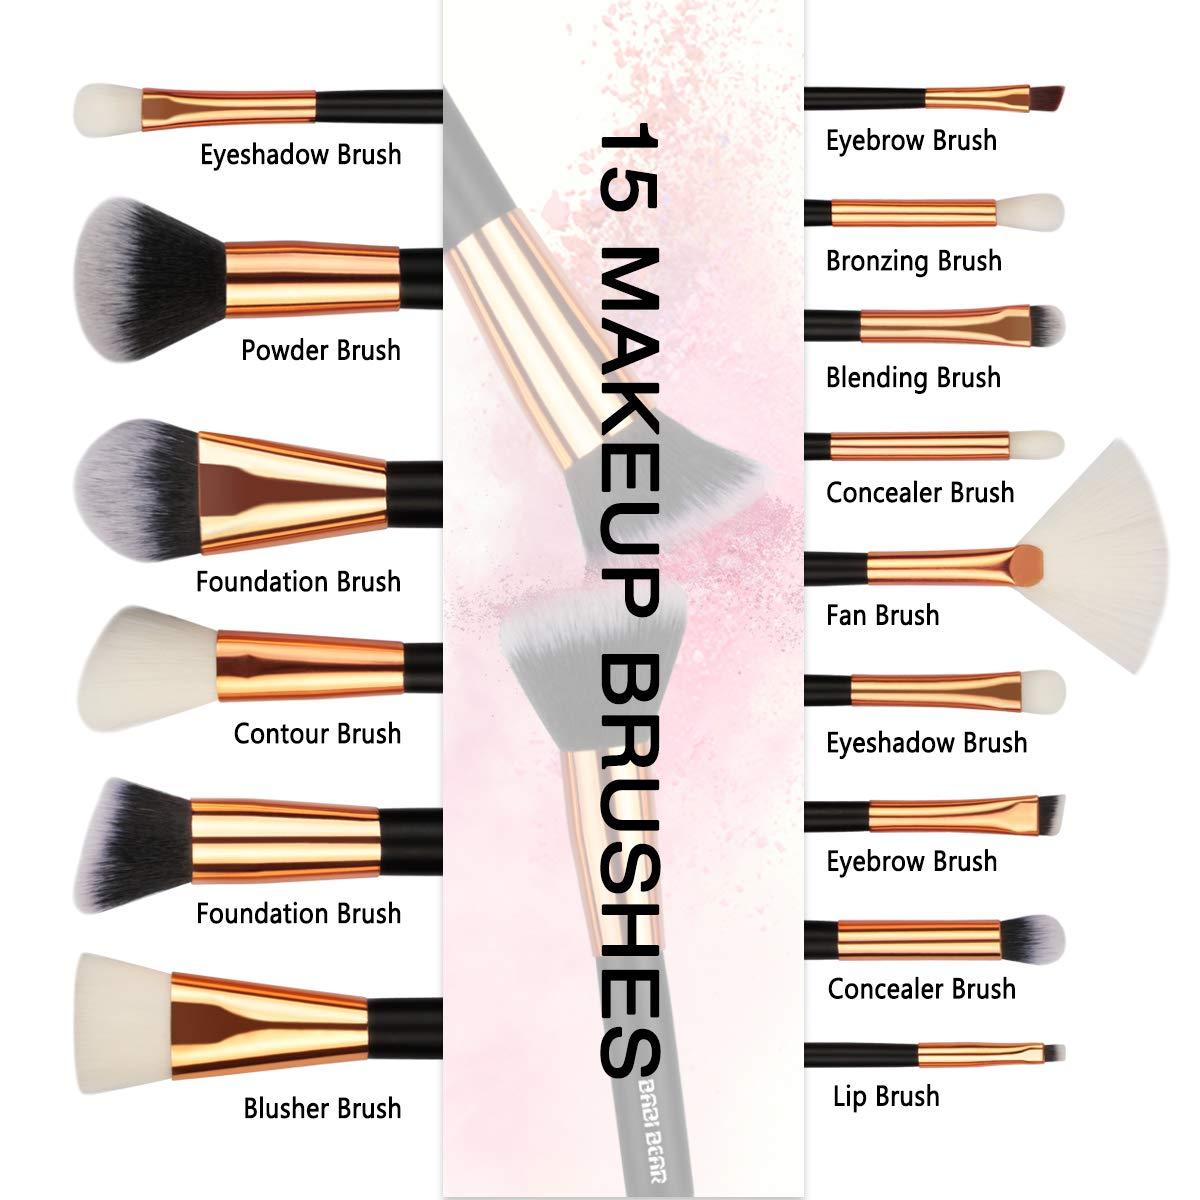 BABI BEAR 15 PCs Makeup Brushes Set Premium Synthetic Kabuki Foundation  Brush Professional Wooden Handle Makeup Brush with Makeup Sponge Brush  Cleaner